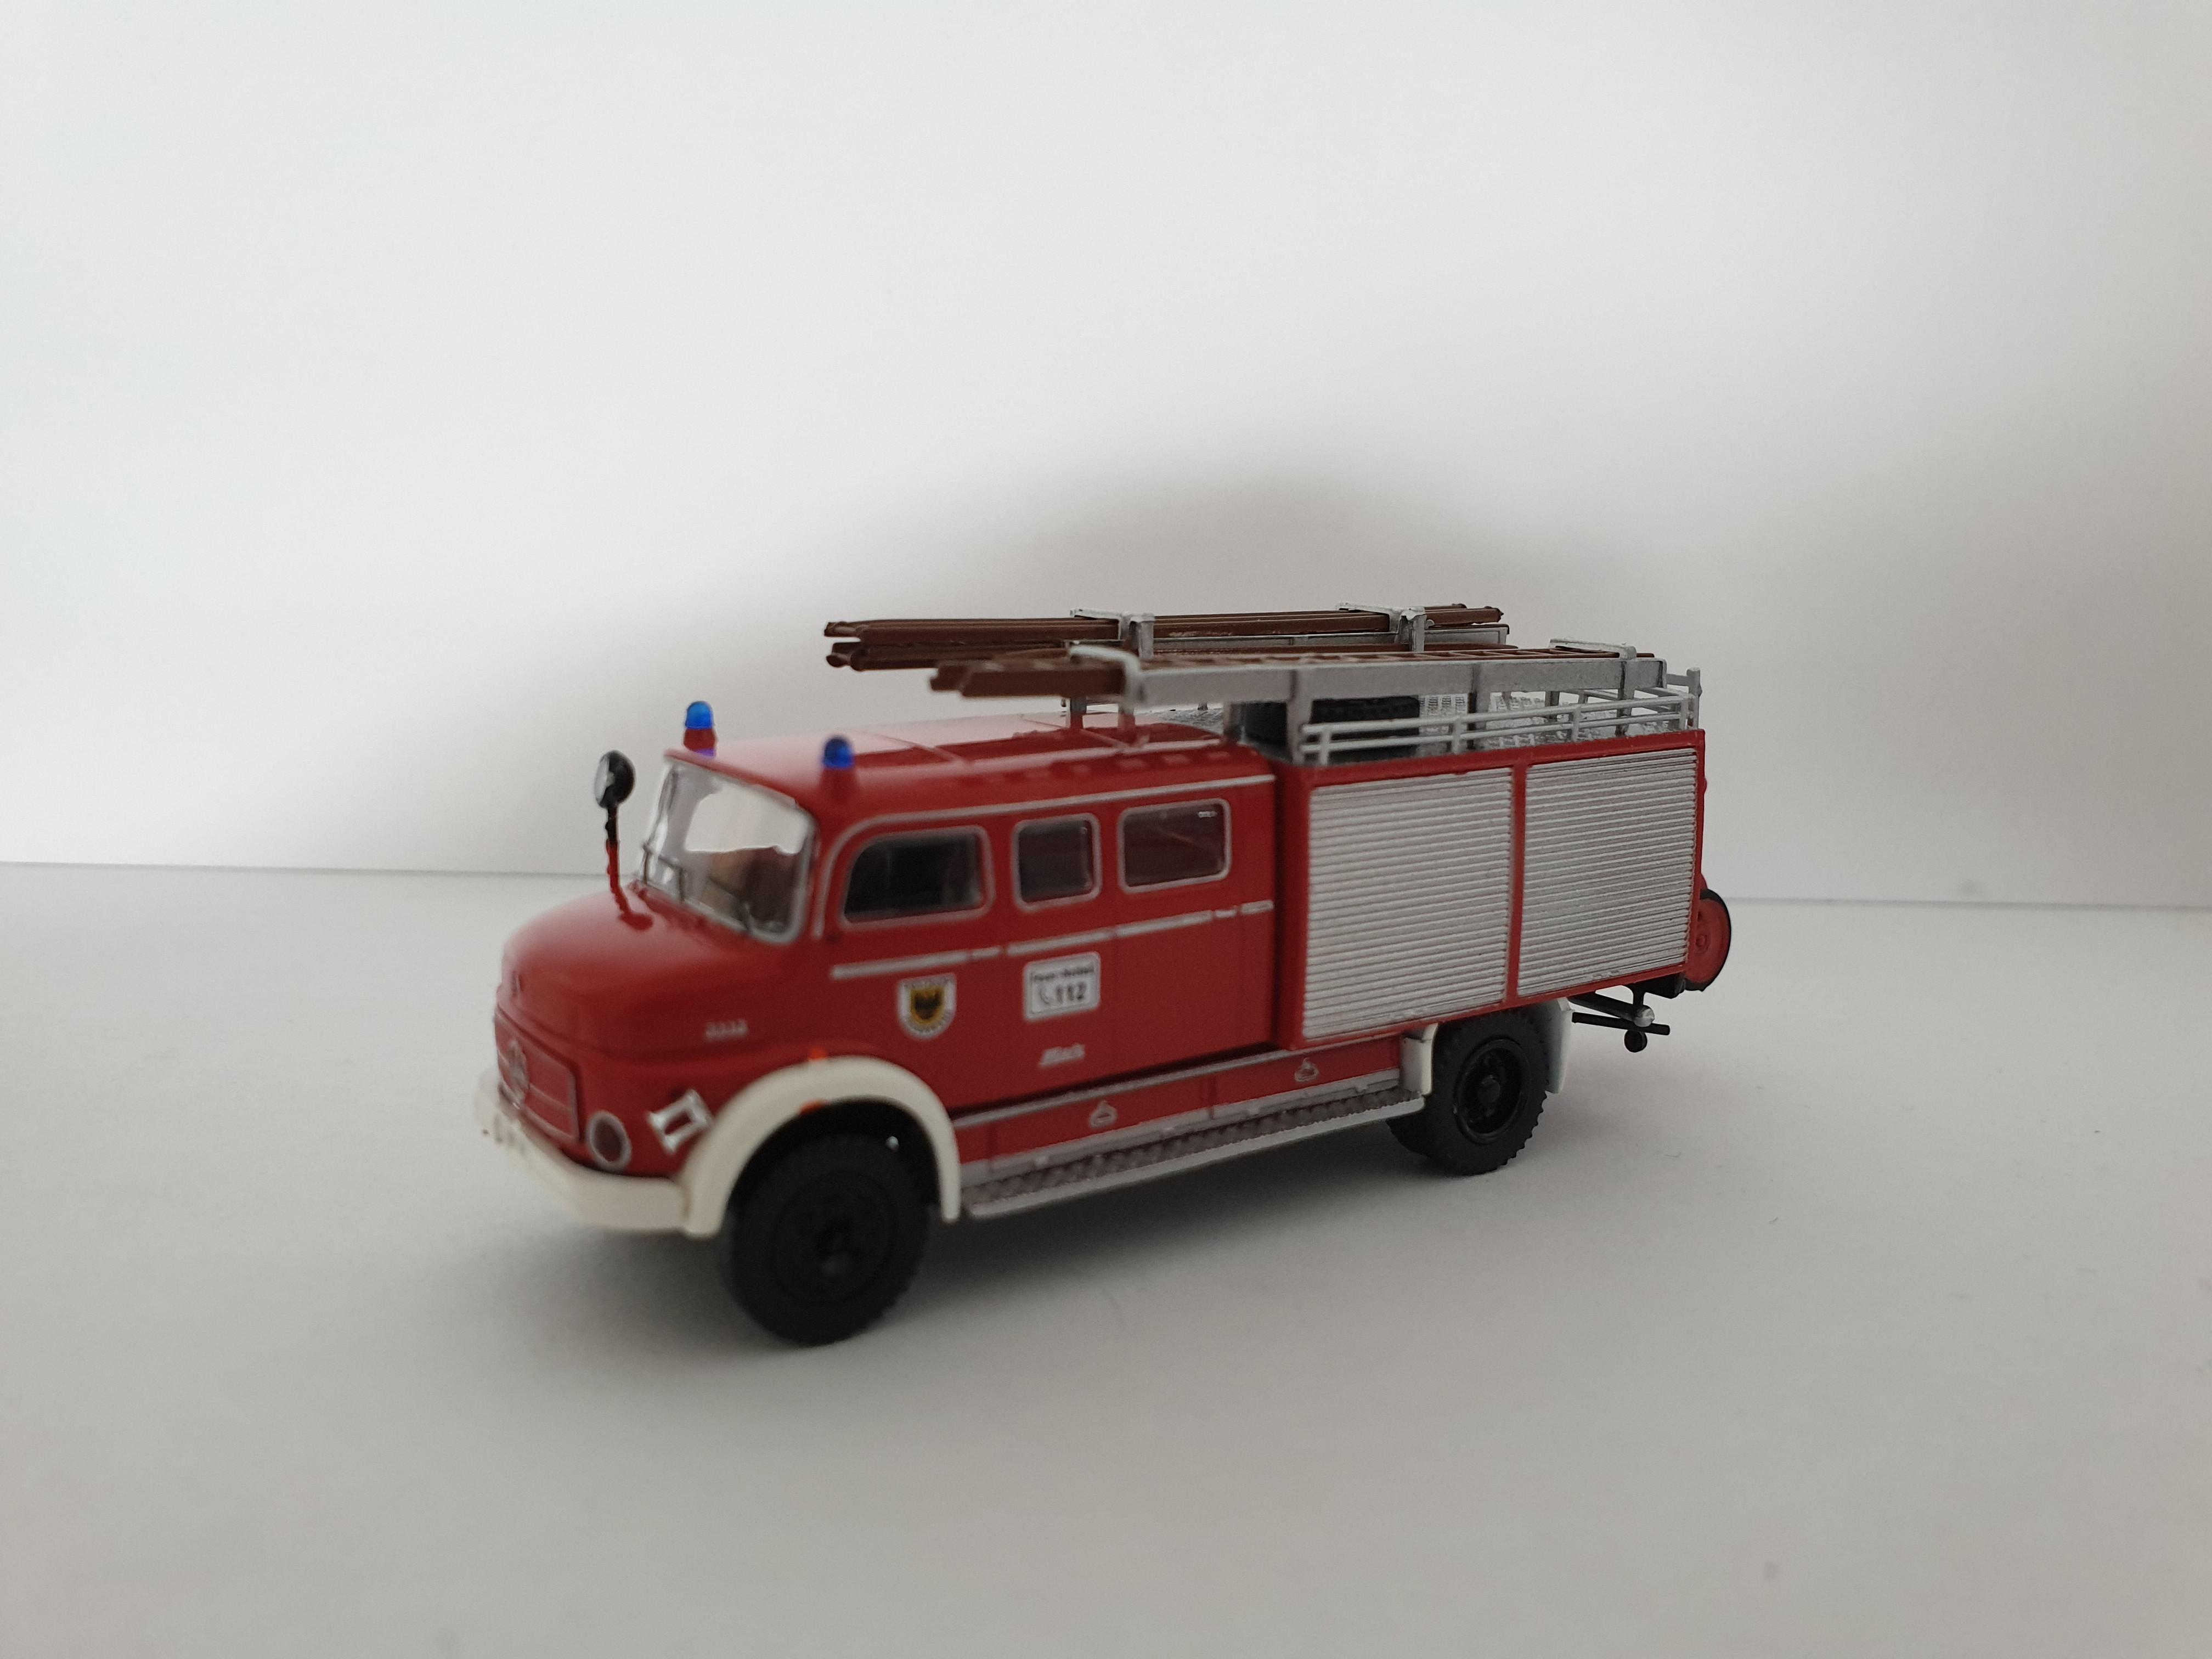 Brekina MB LAF 1113 LF 16 Feuerwehr Dortmund / Sondermodell Intermodellbau 2019